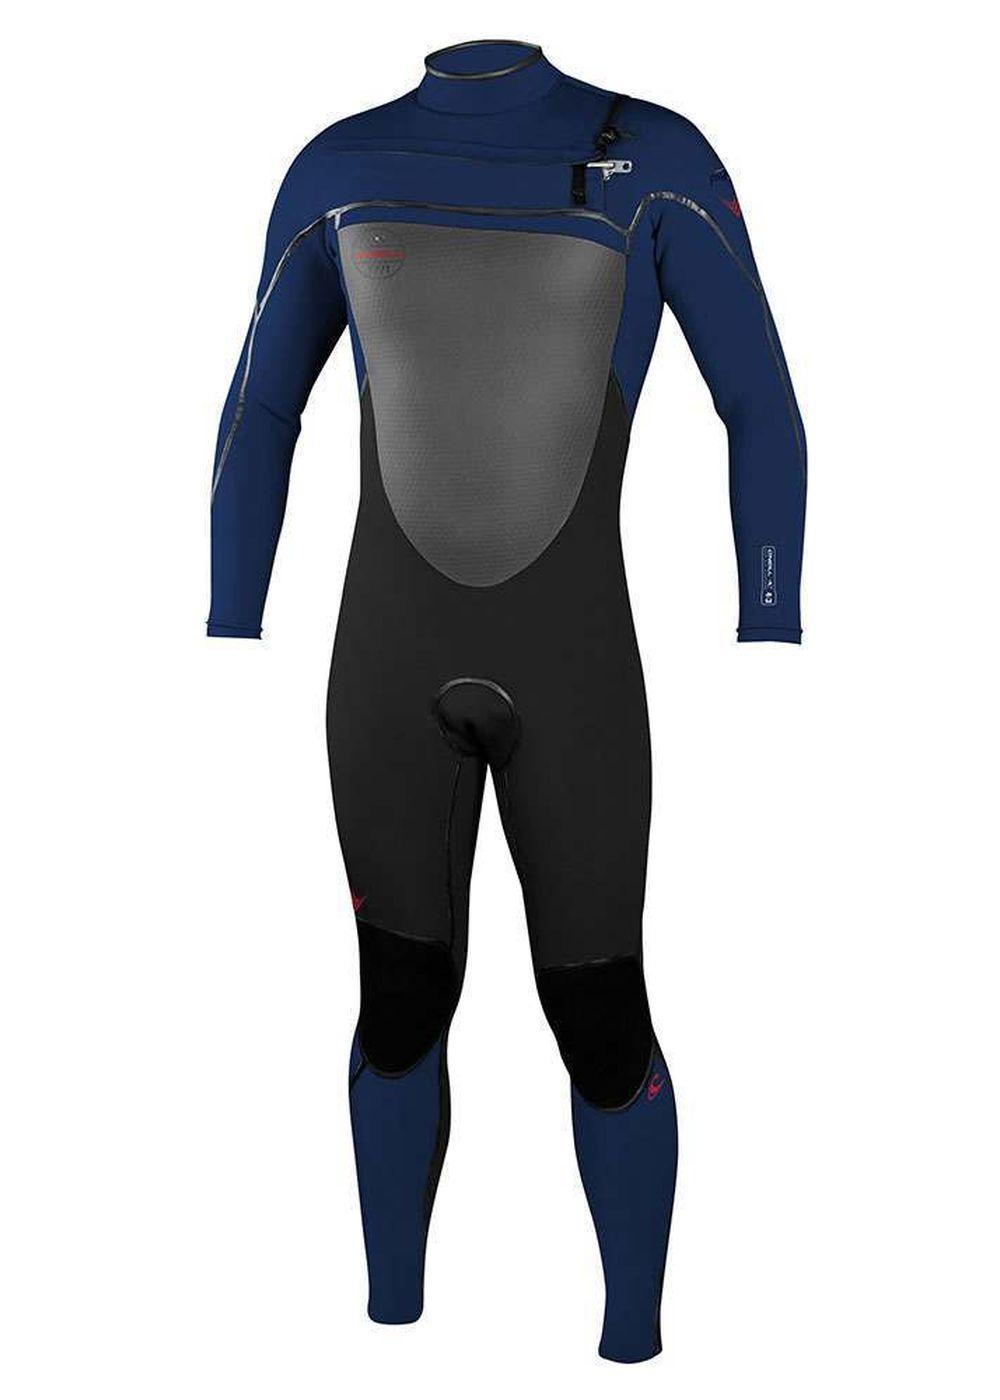 Oneill Psycho Freak Fz 5/4 Ssw Wetsuit 2017 Navy Picture